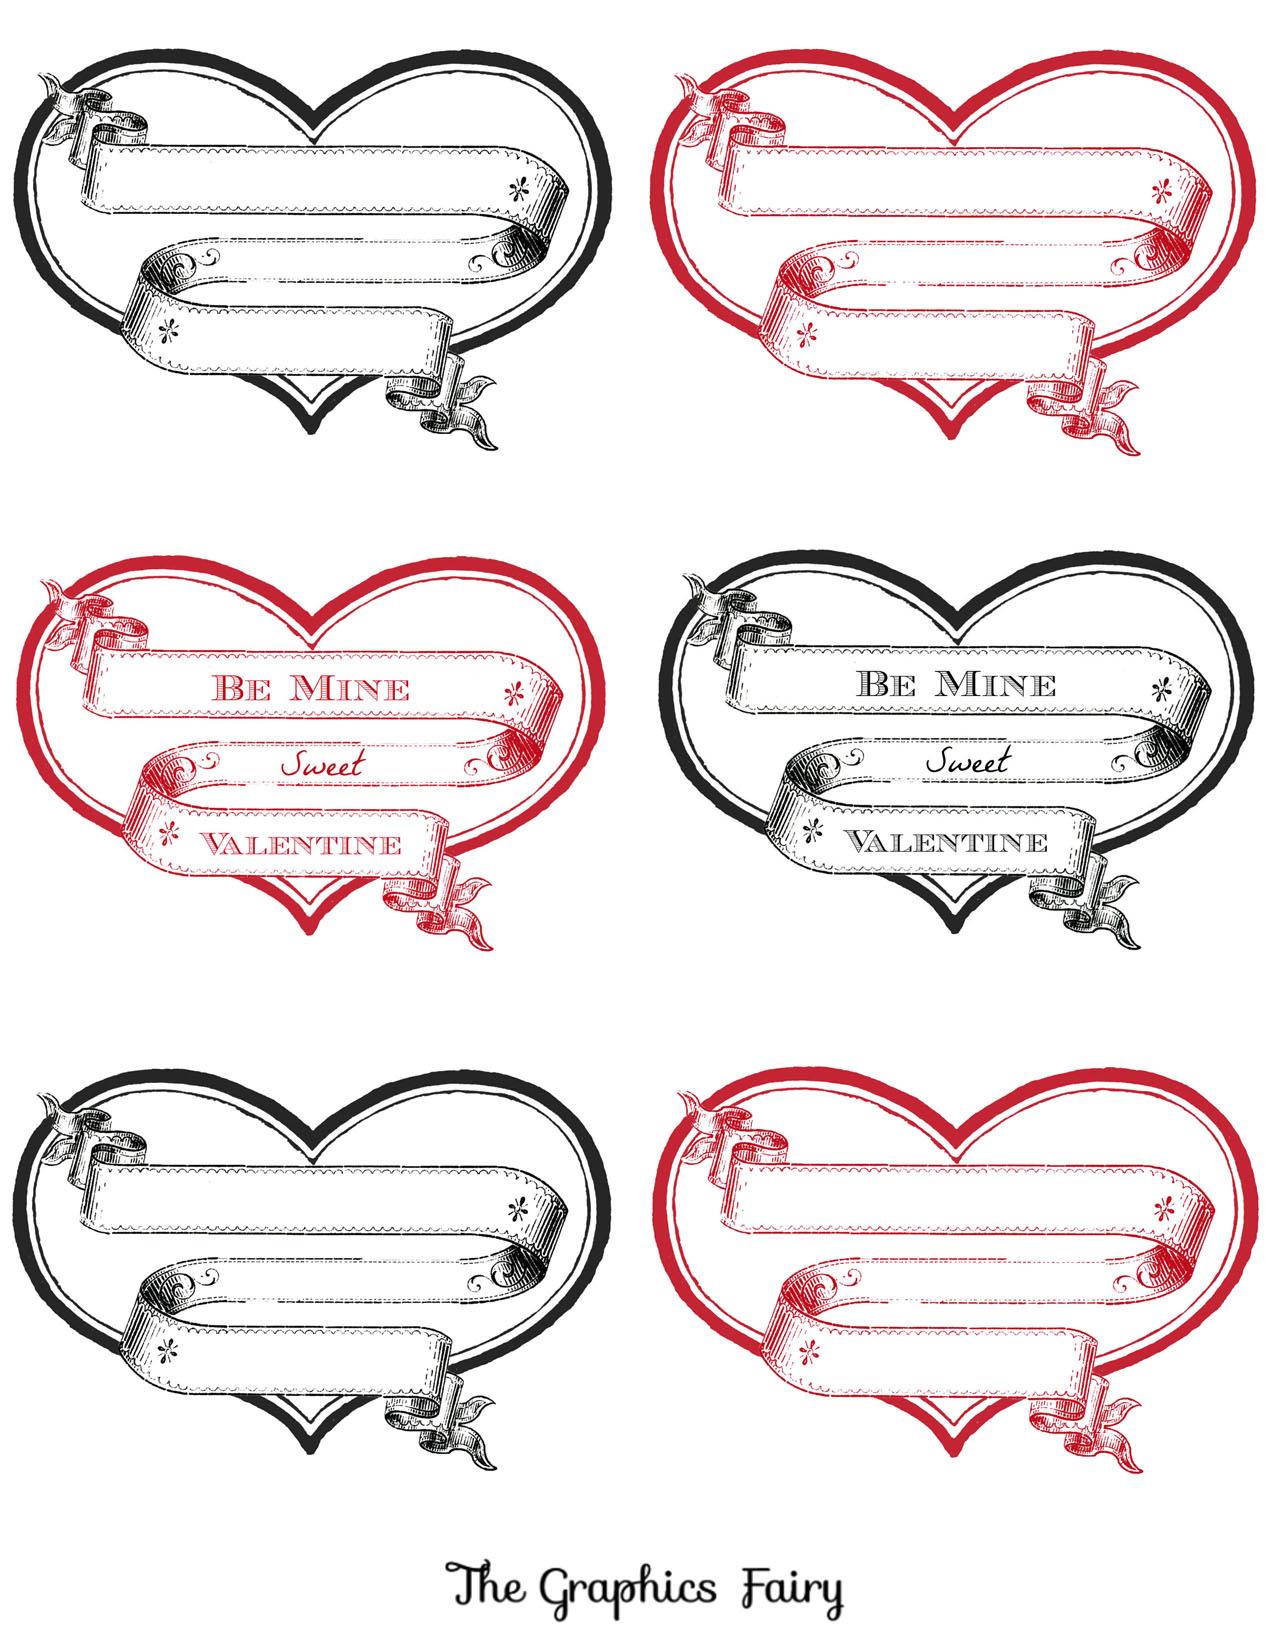 Free Printable Price Stickers - Free Printable Price Labels